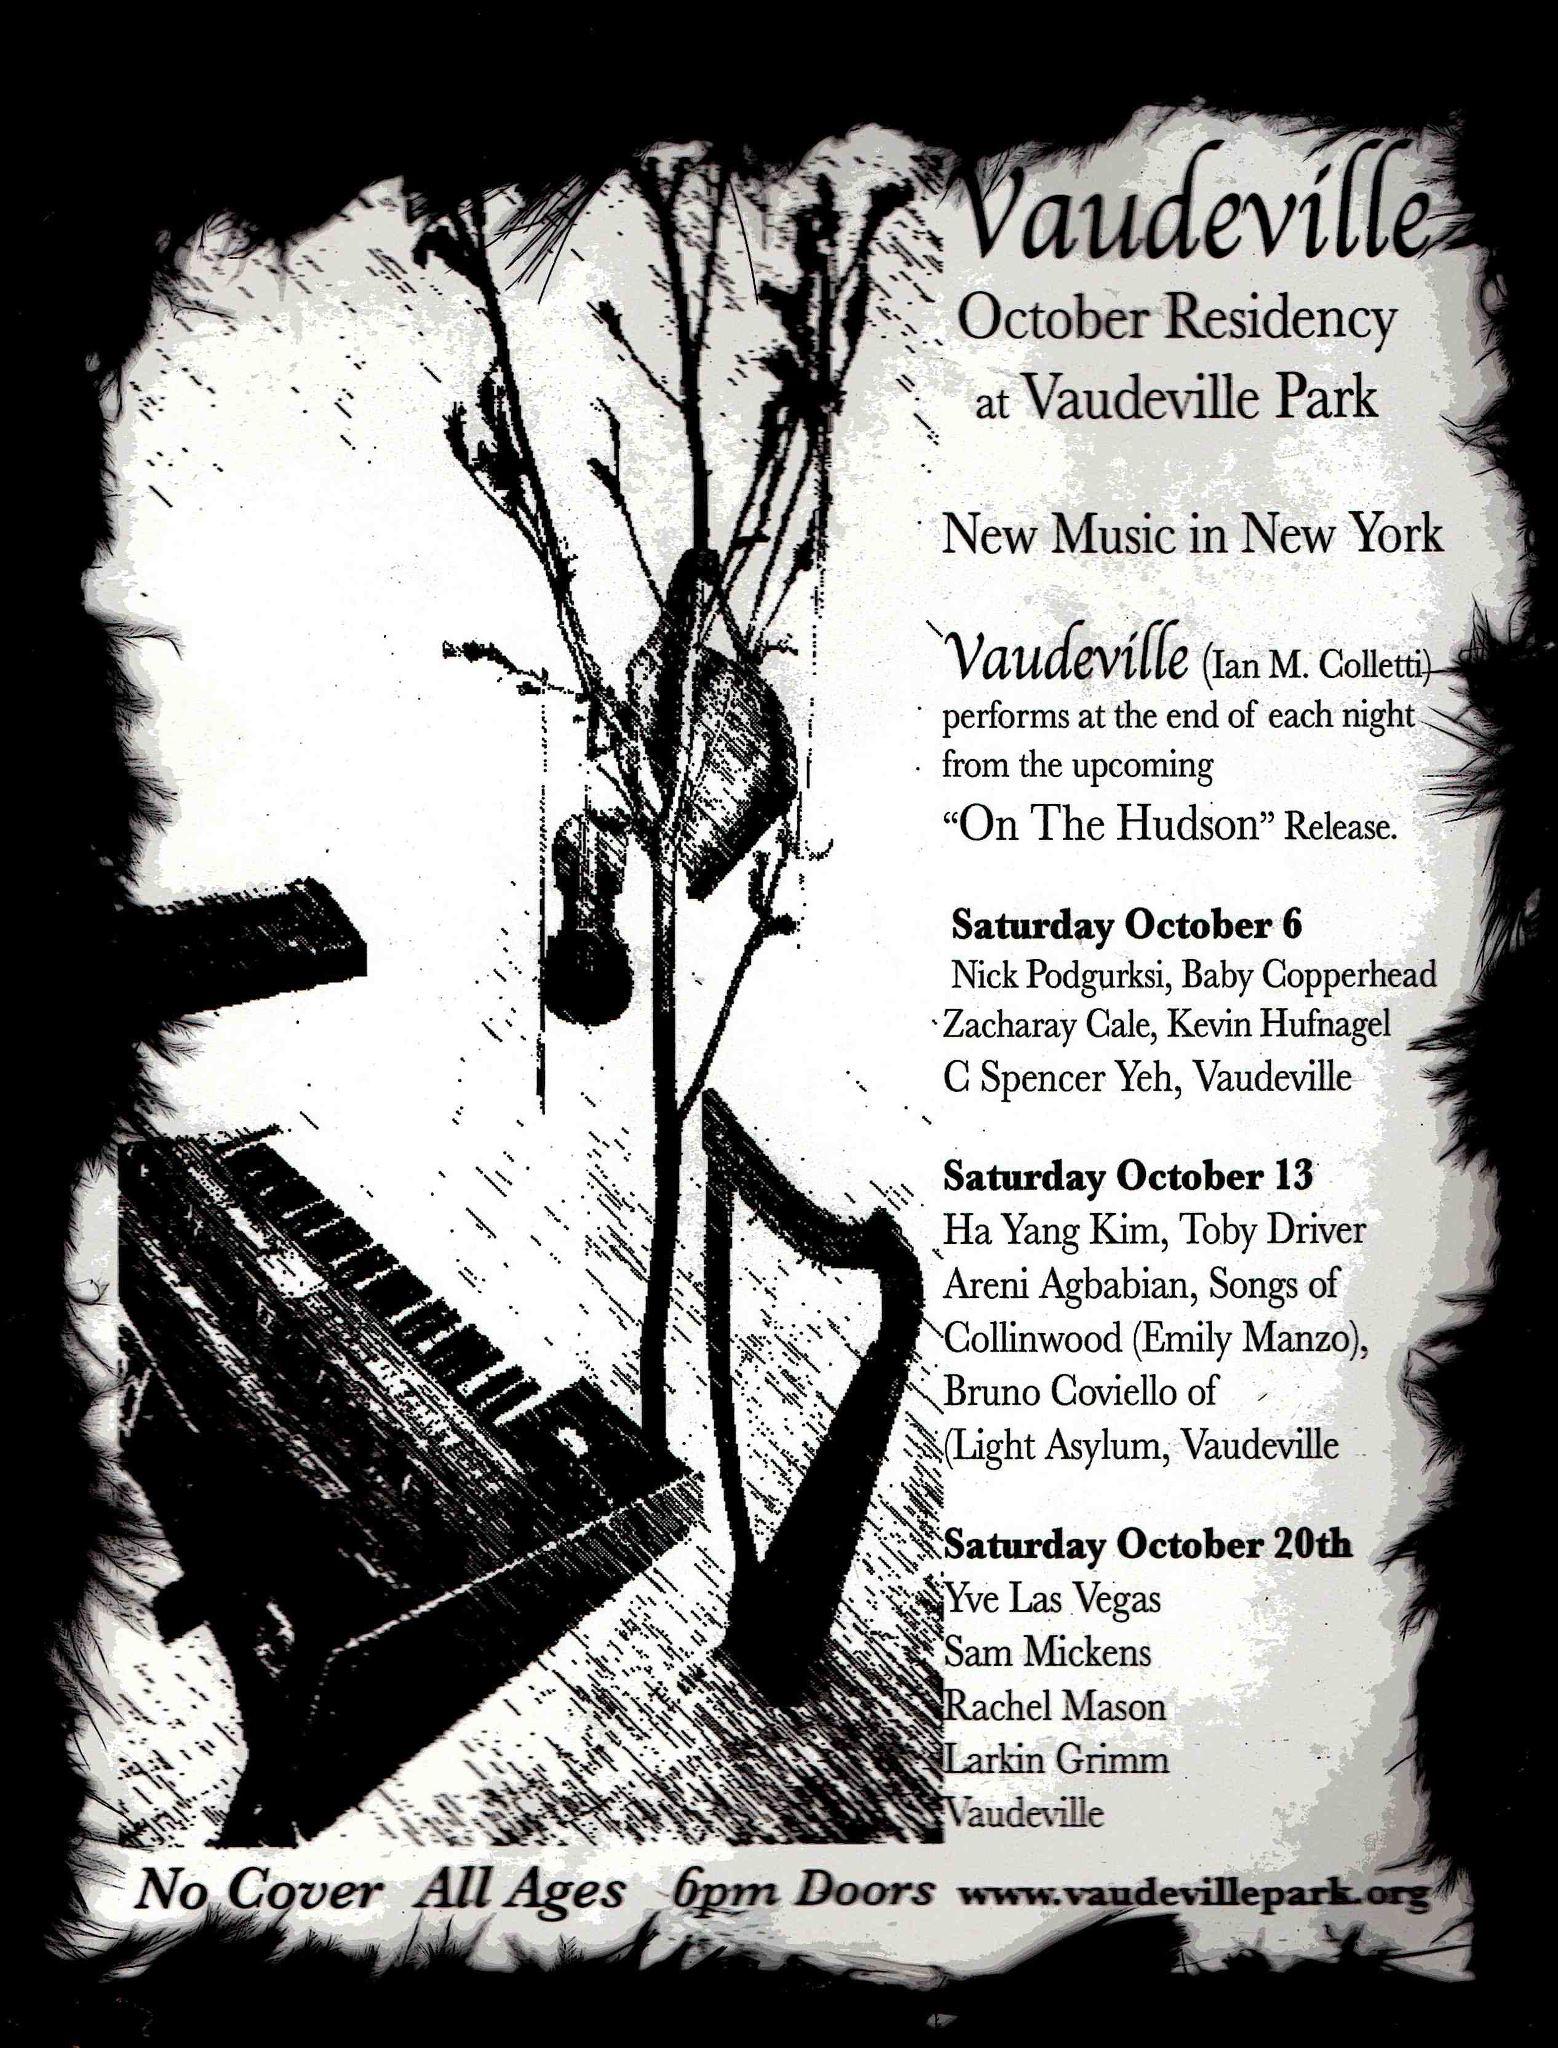 Vaudeville October Residency 1.jpg